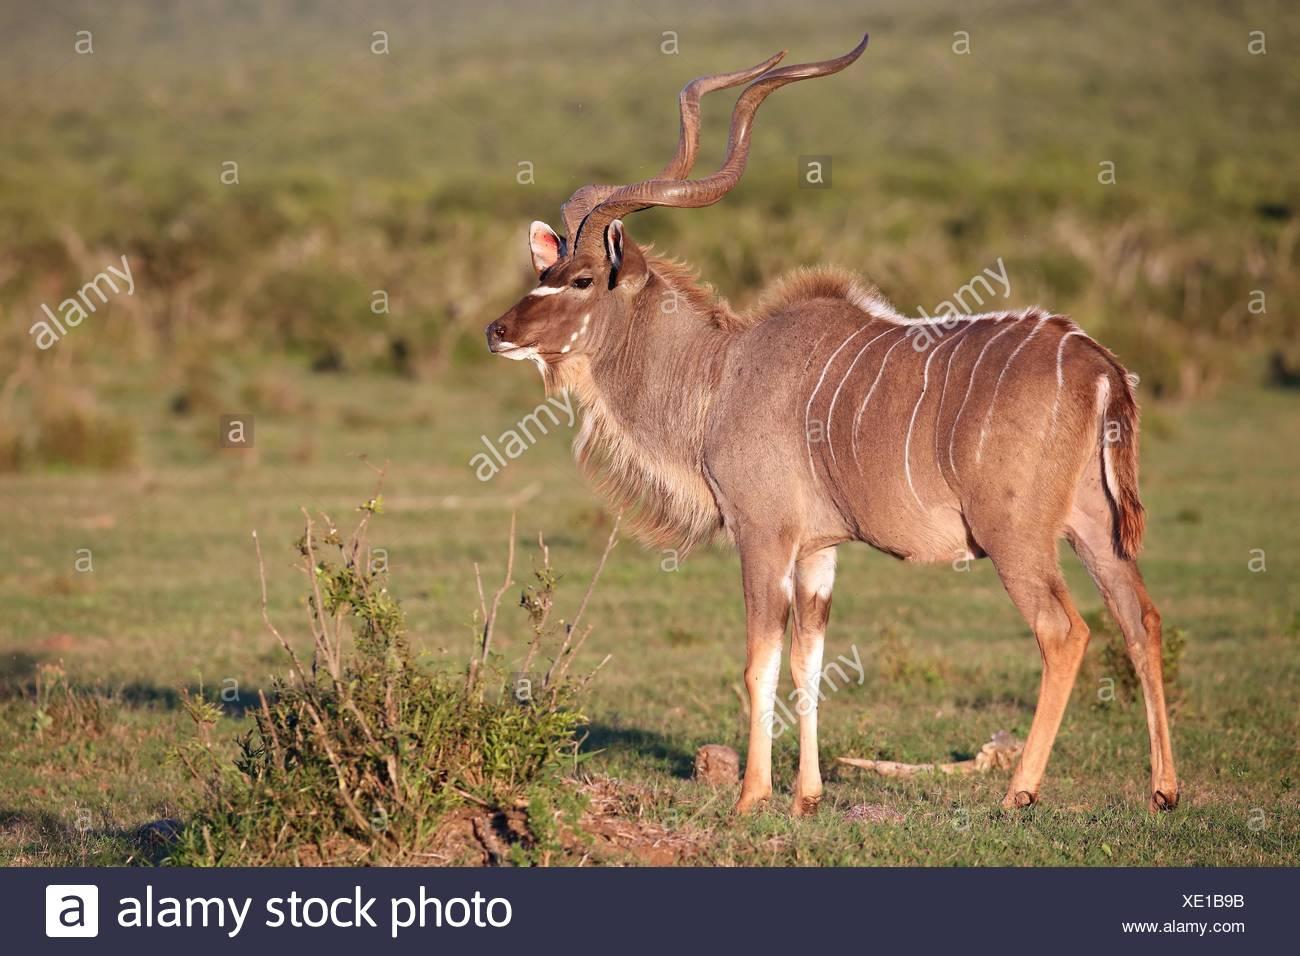 Kudu Antelope Male - Stock Image